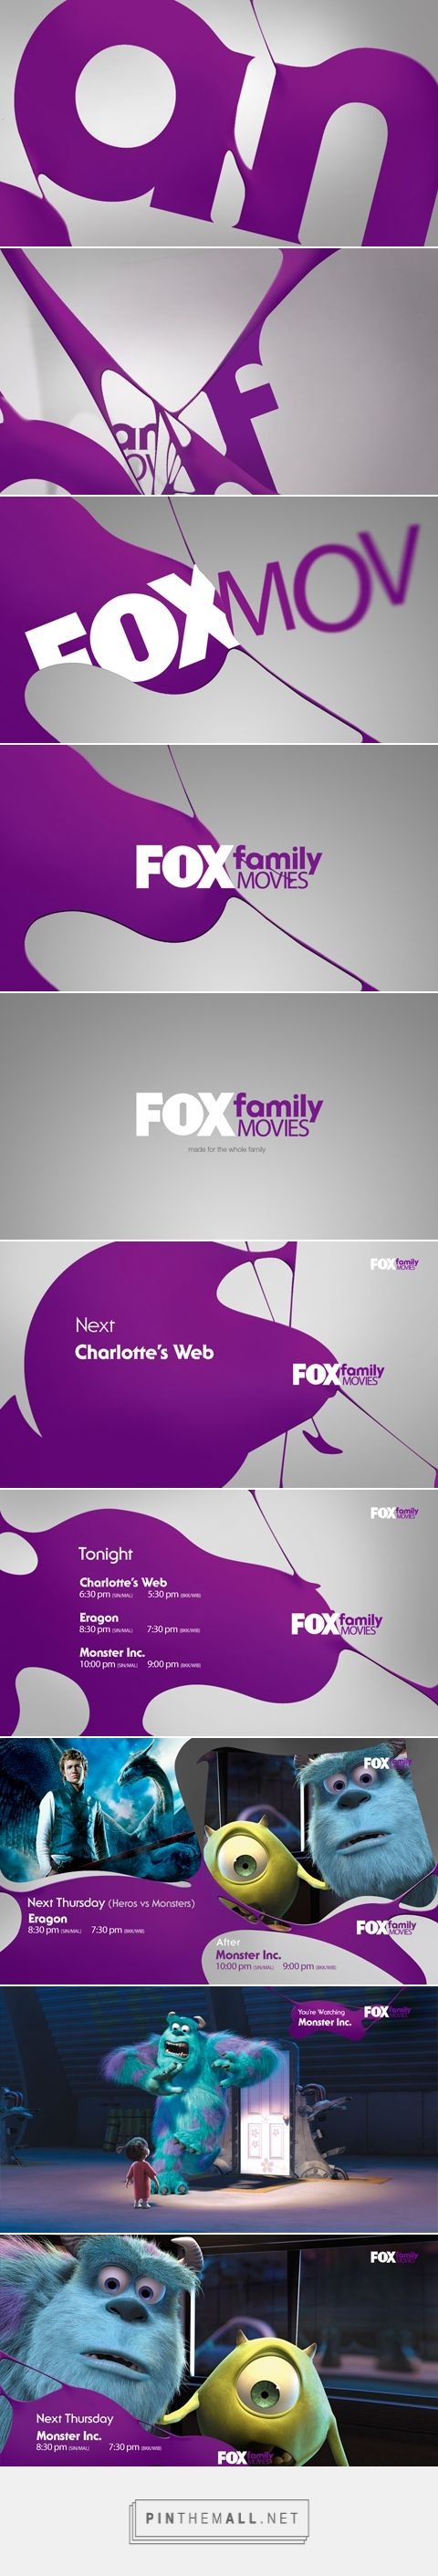 FOX FAMILY MOVIES BRANDING PITCH on Behance - created via https://pinthemall.net